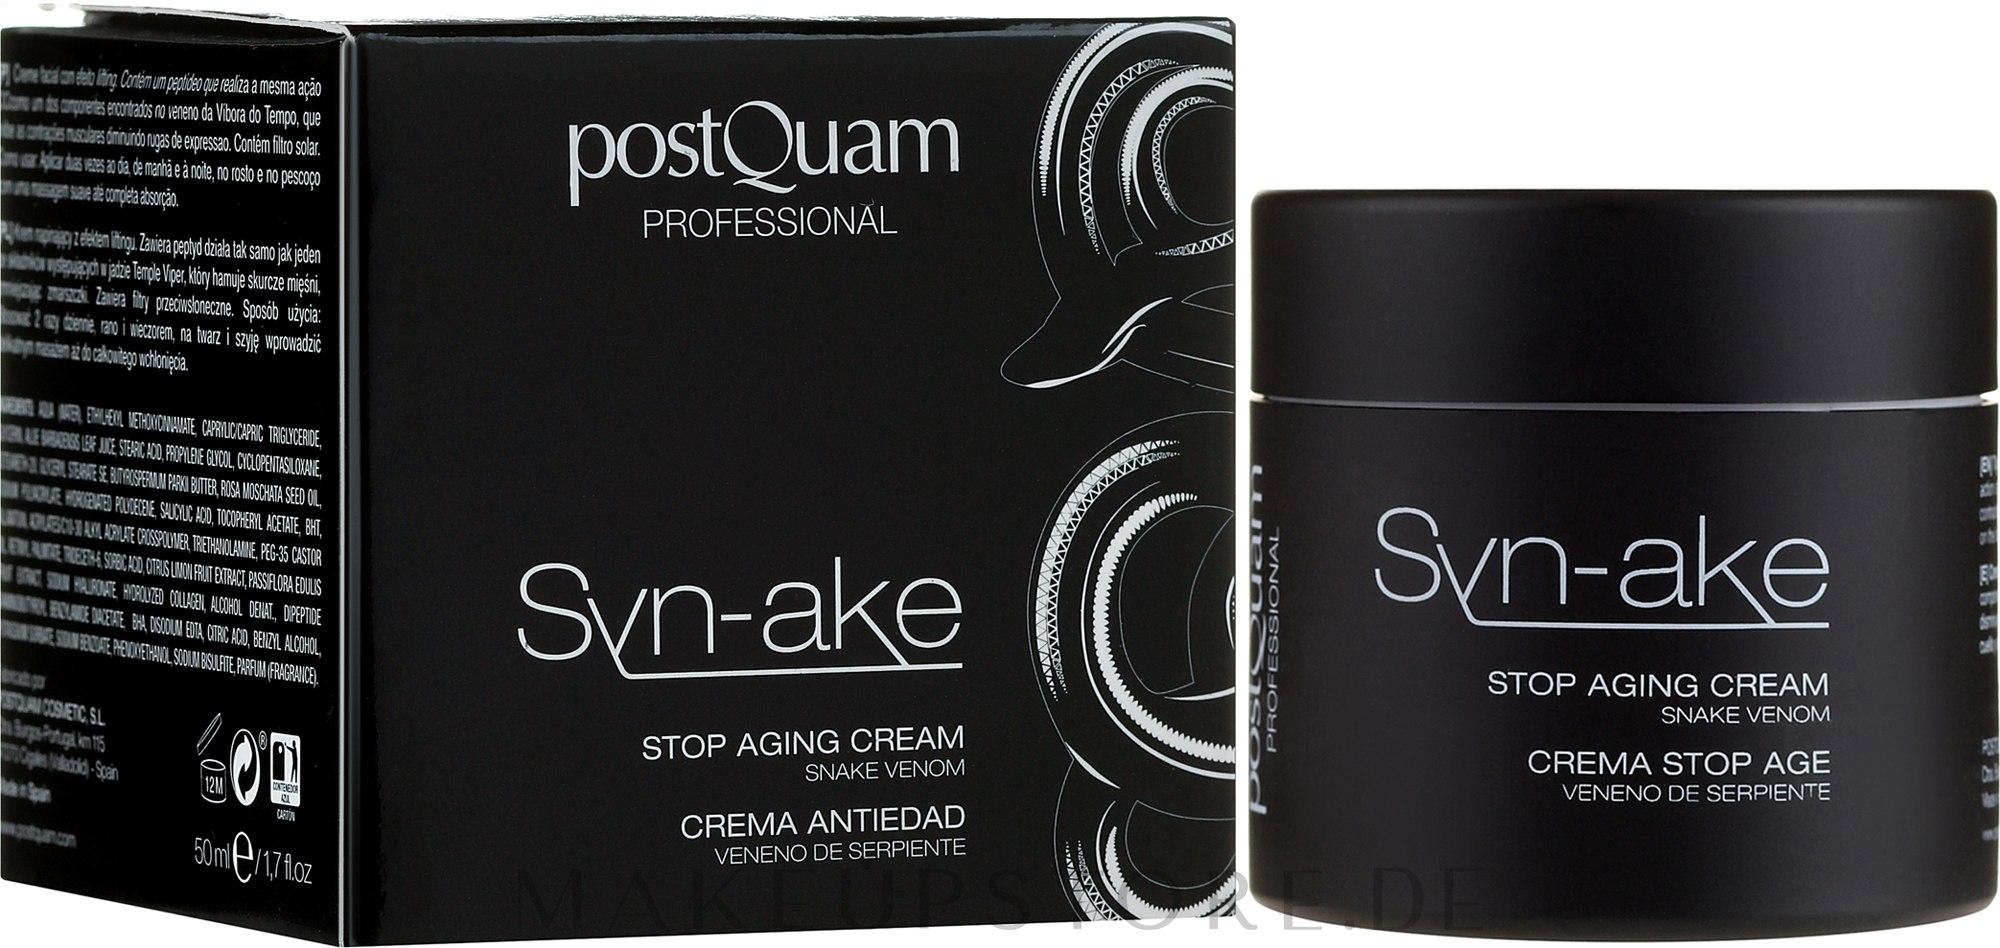 Anti-Aging Gesichtscreme - Postquam Syn-ake Stop Aging Cream — Bild 50 ml